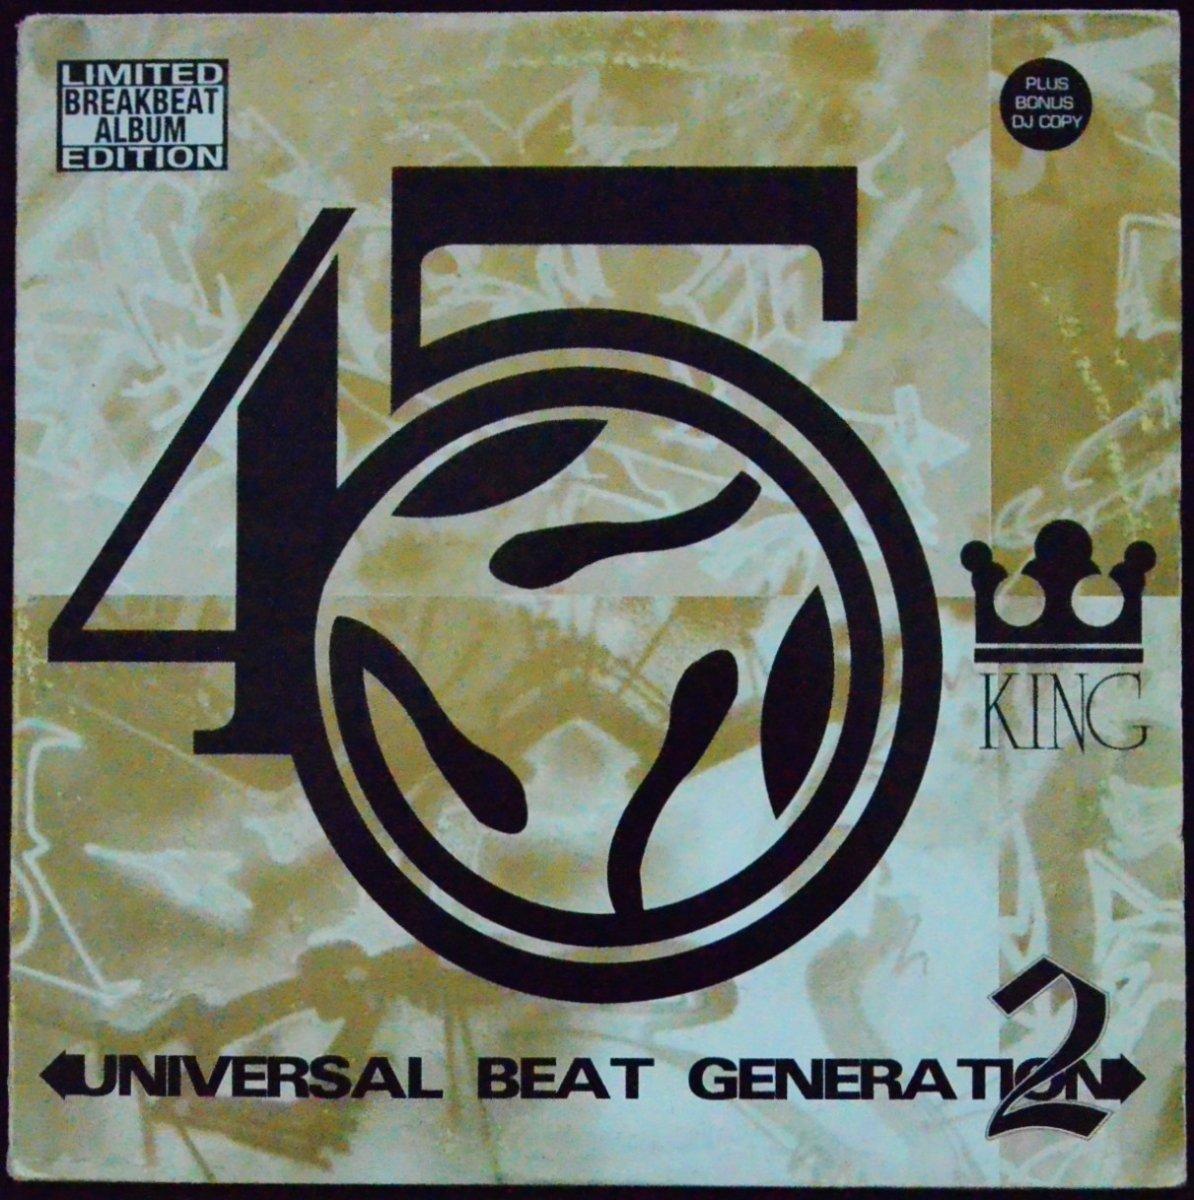 THE 45 KING / UNIVERSAL BEAT GENERATION 2 (2LP)